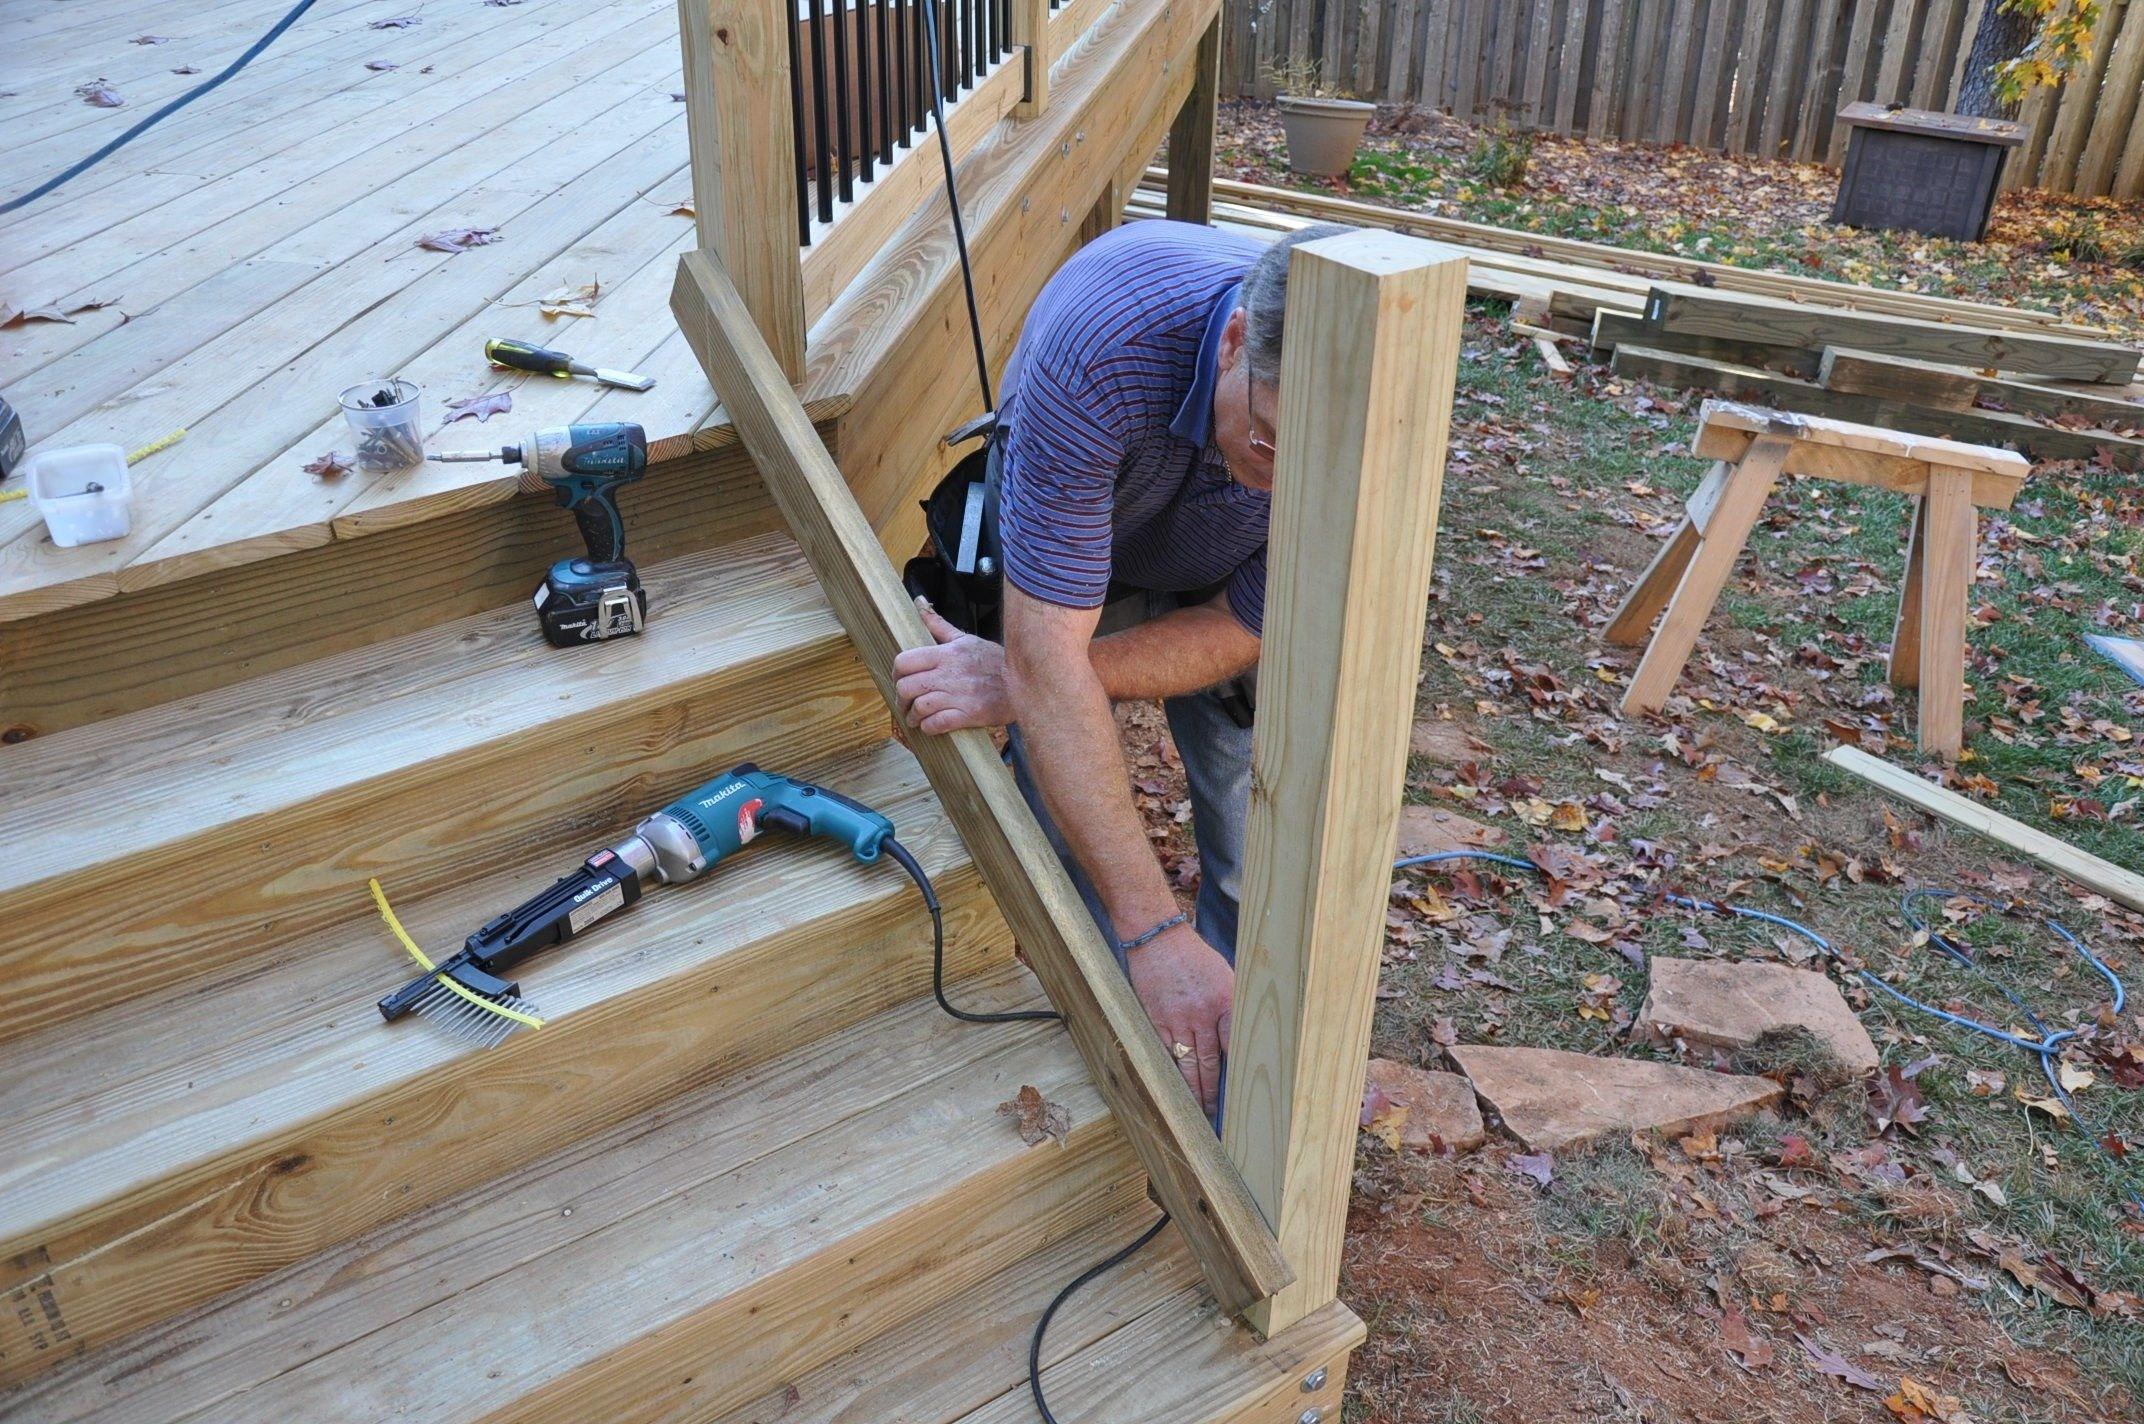 How To Install Deck Stair Railings Decks Com   Exterior Stair Railings Near Me   Stair Treads   Porch   Front Porch   Porch Railing   Railing Ideas